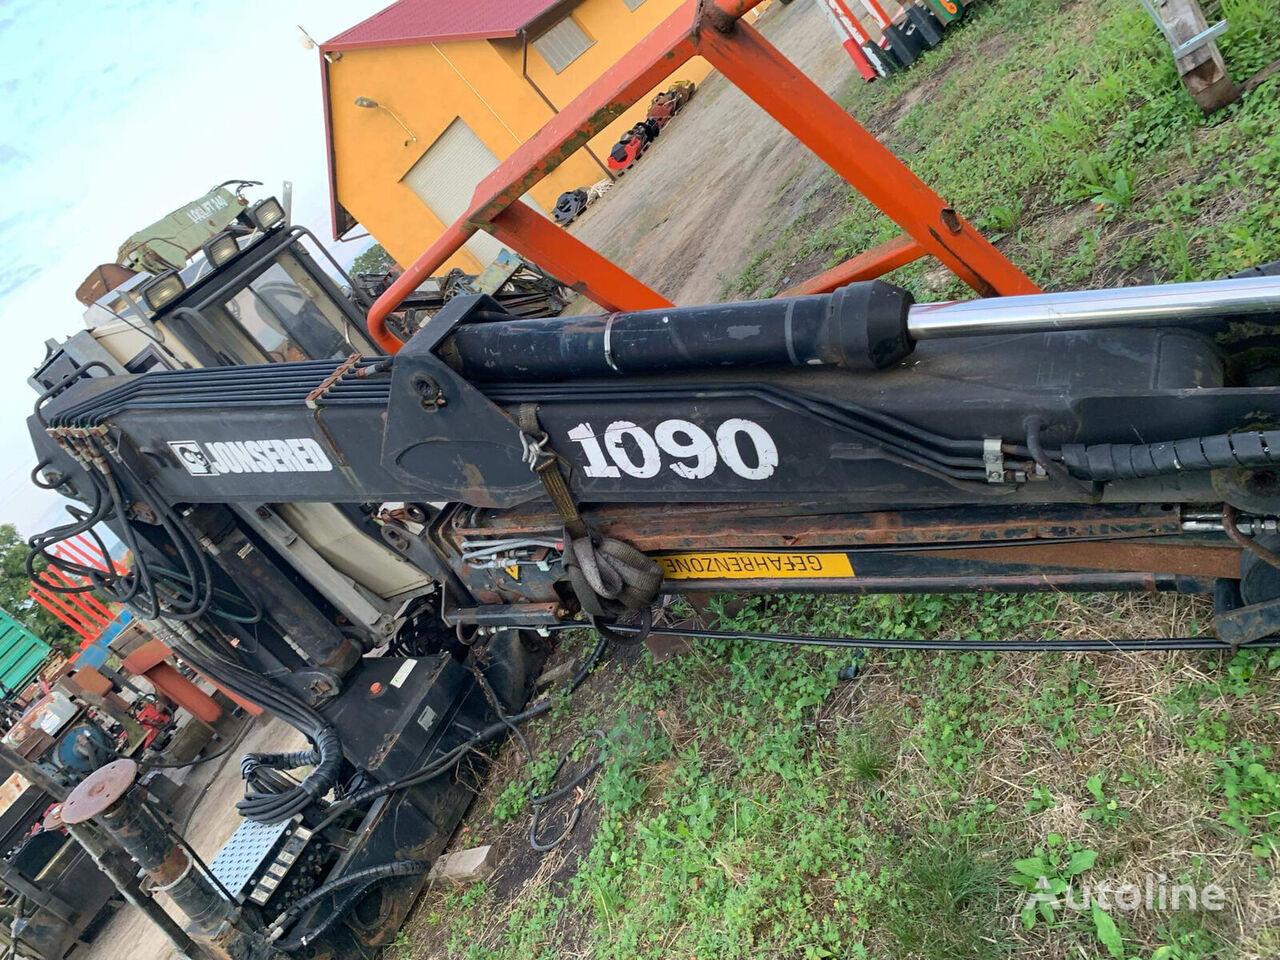 LOGLIFT Jonsered 1090 loader crane